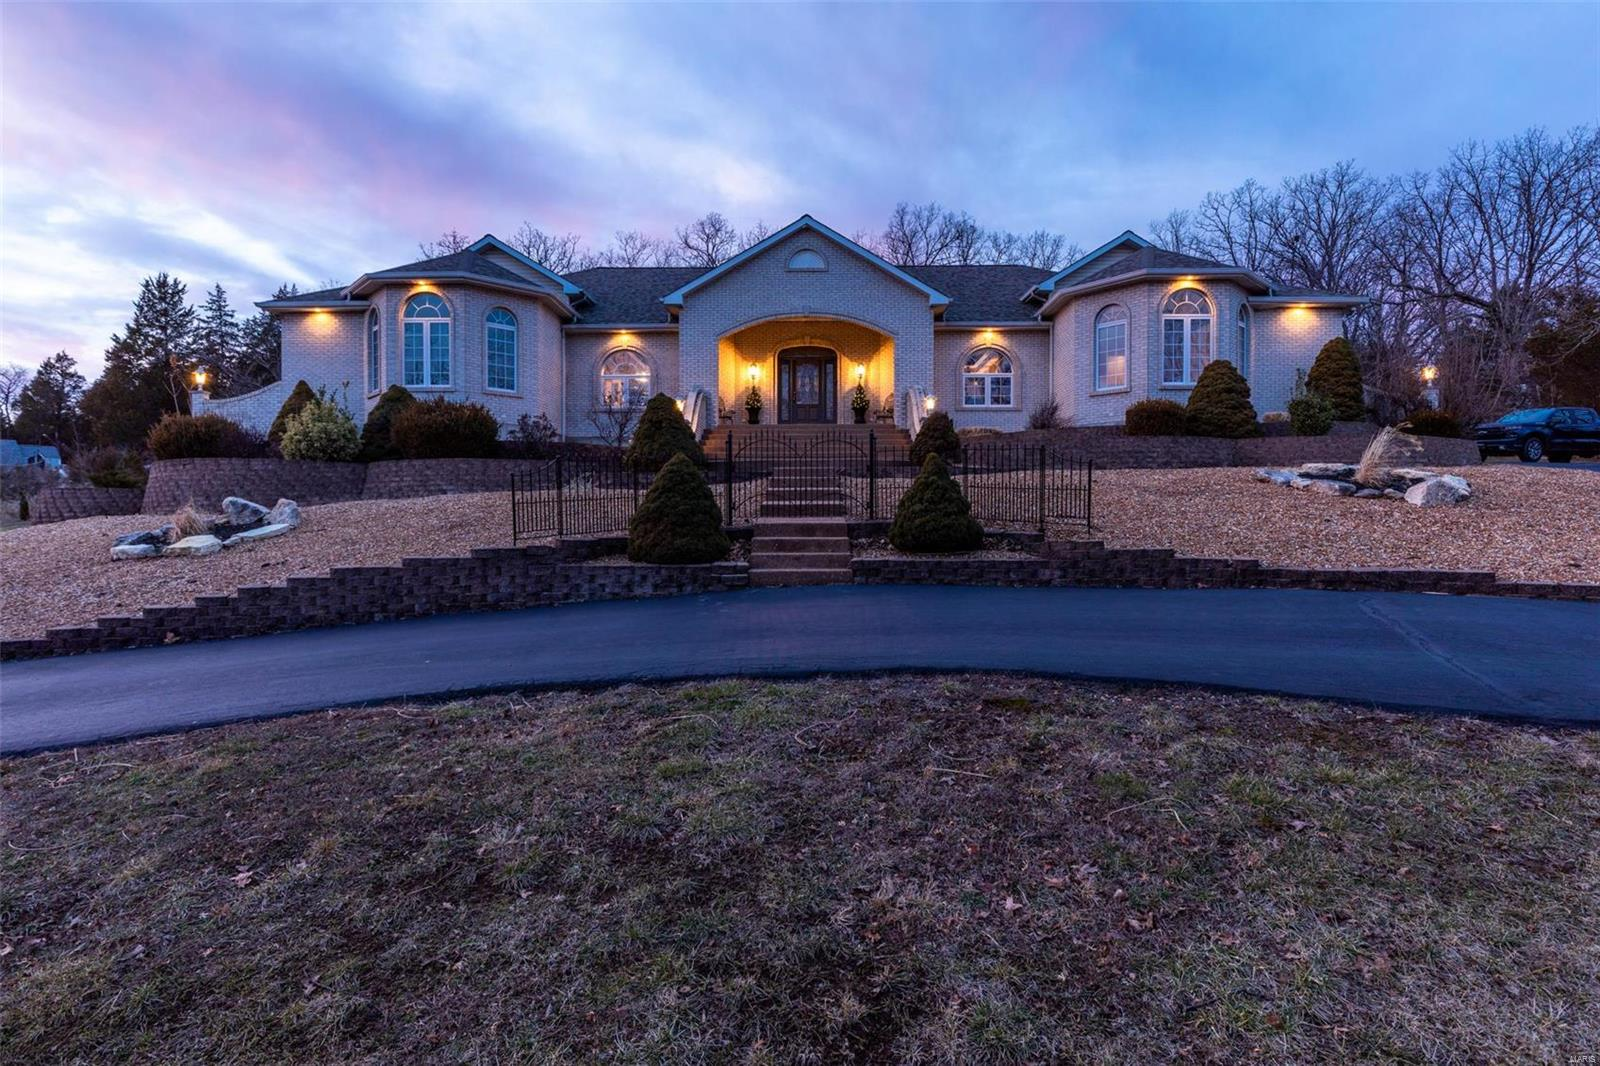 10575 Glen Oaks Property Photo - Festus, MO real estate listing